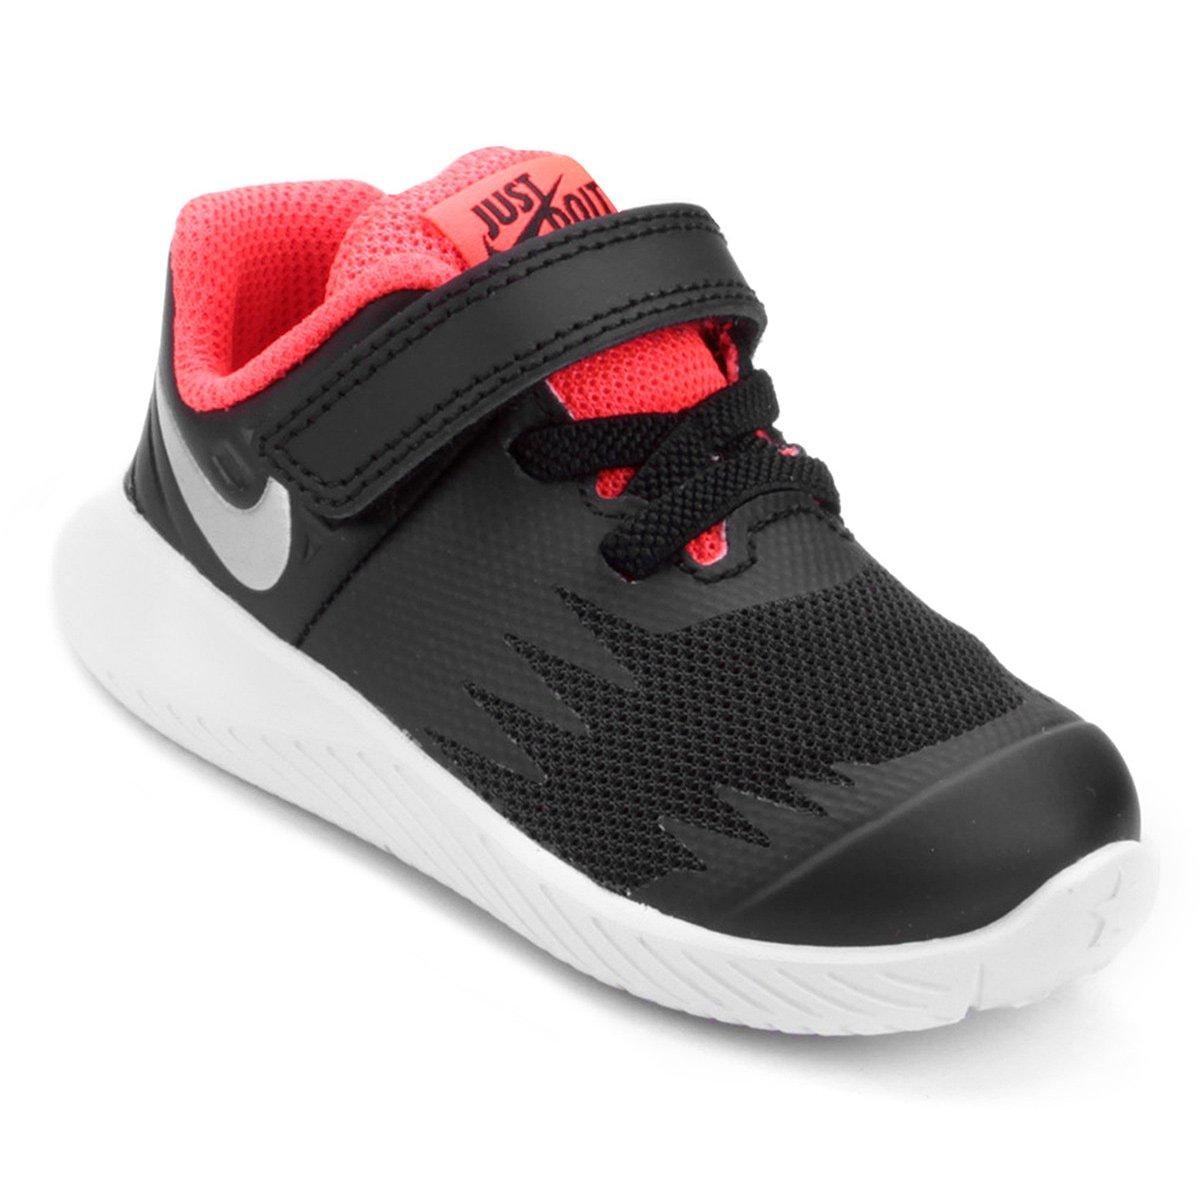 04536544f2c Tênis Infantil Nike Star Runner Masculino - Preto e Prata - Compre Agora